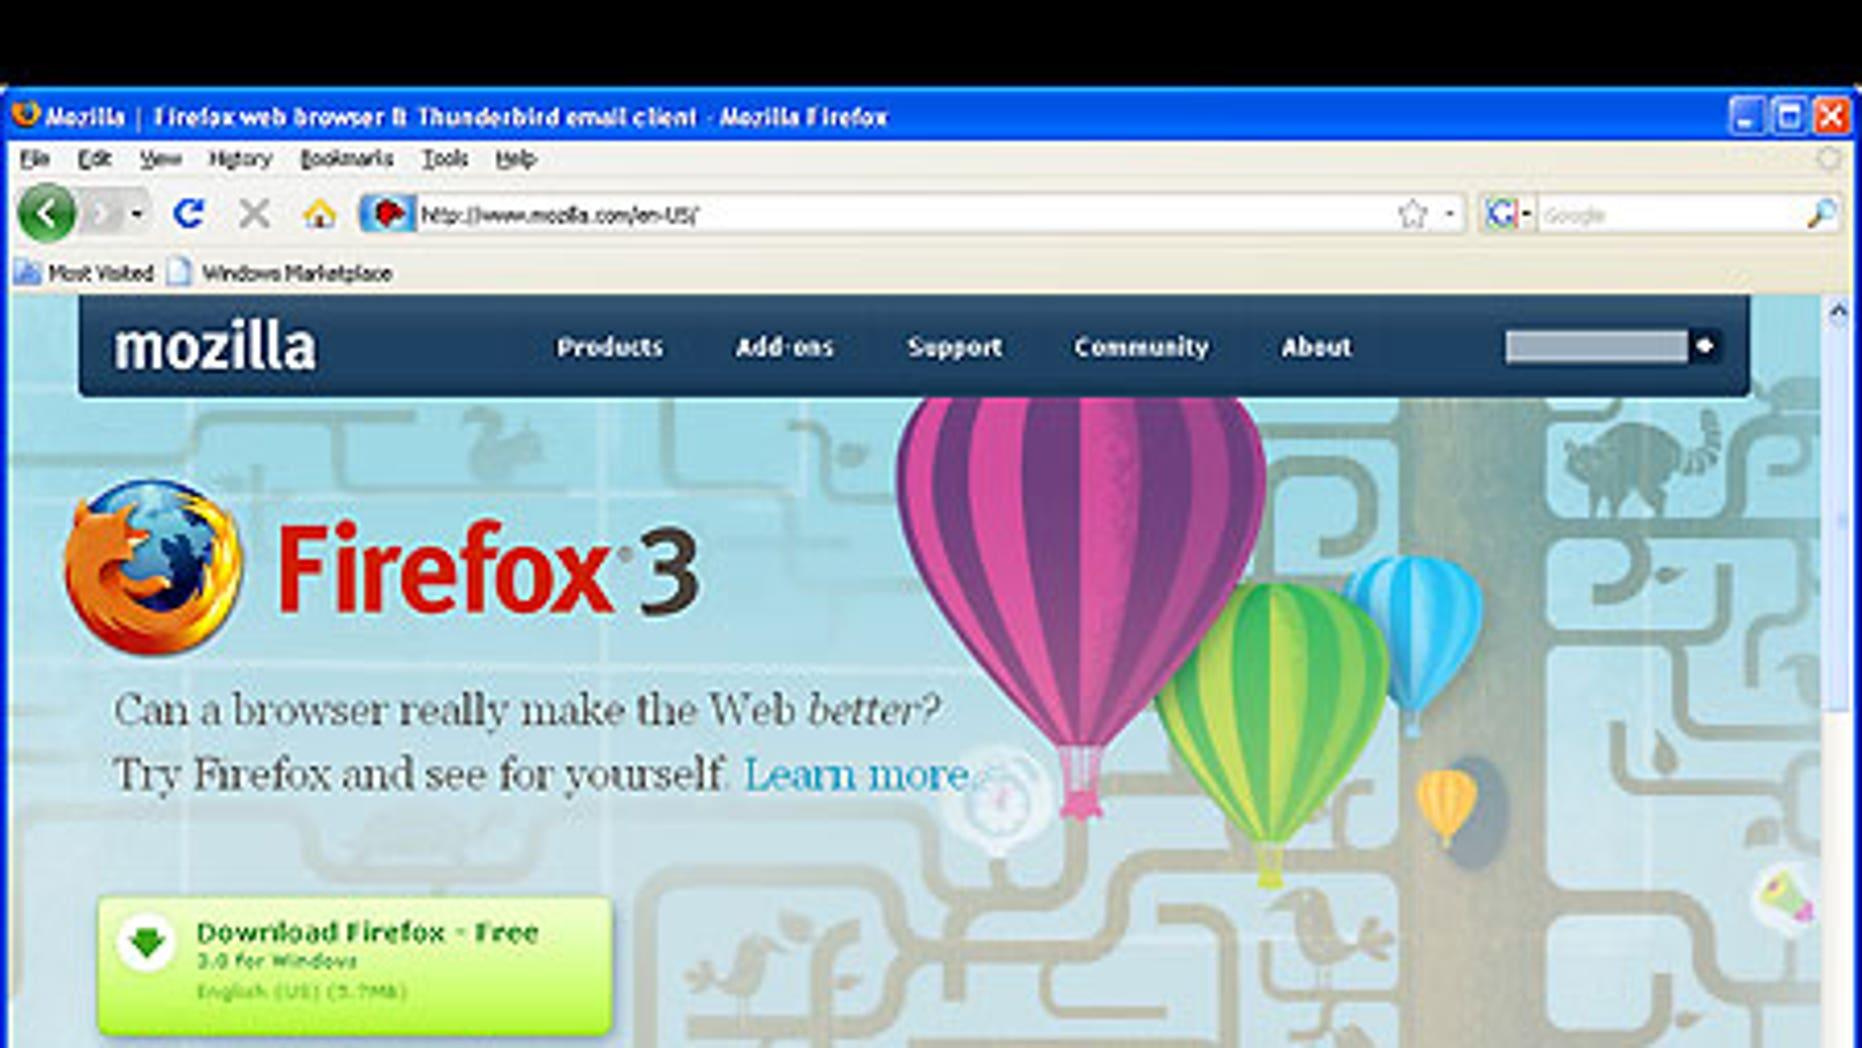 Mozilla's Firefox 3 running in Microsoft's Windows XP.